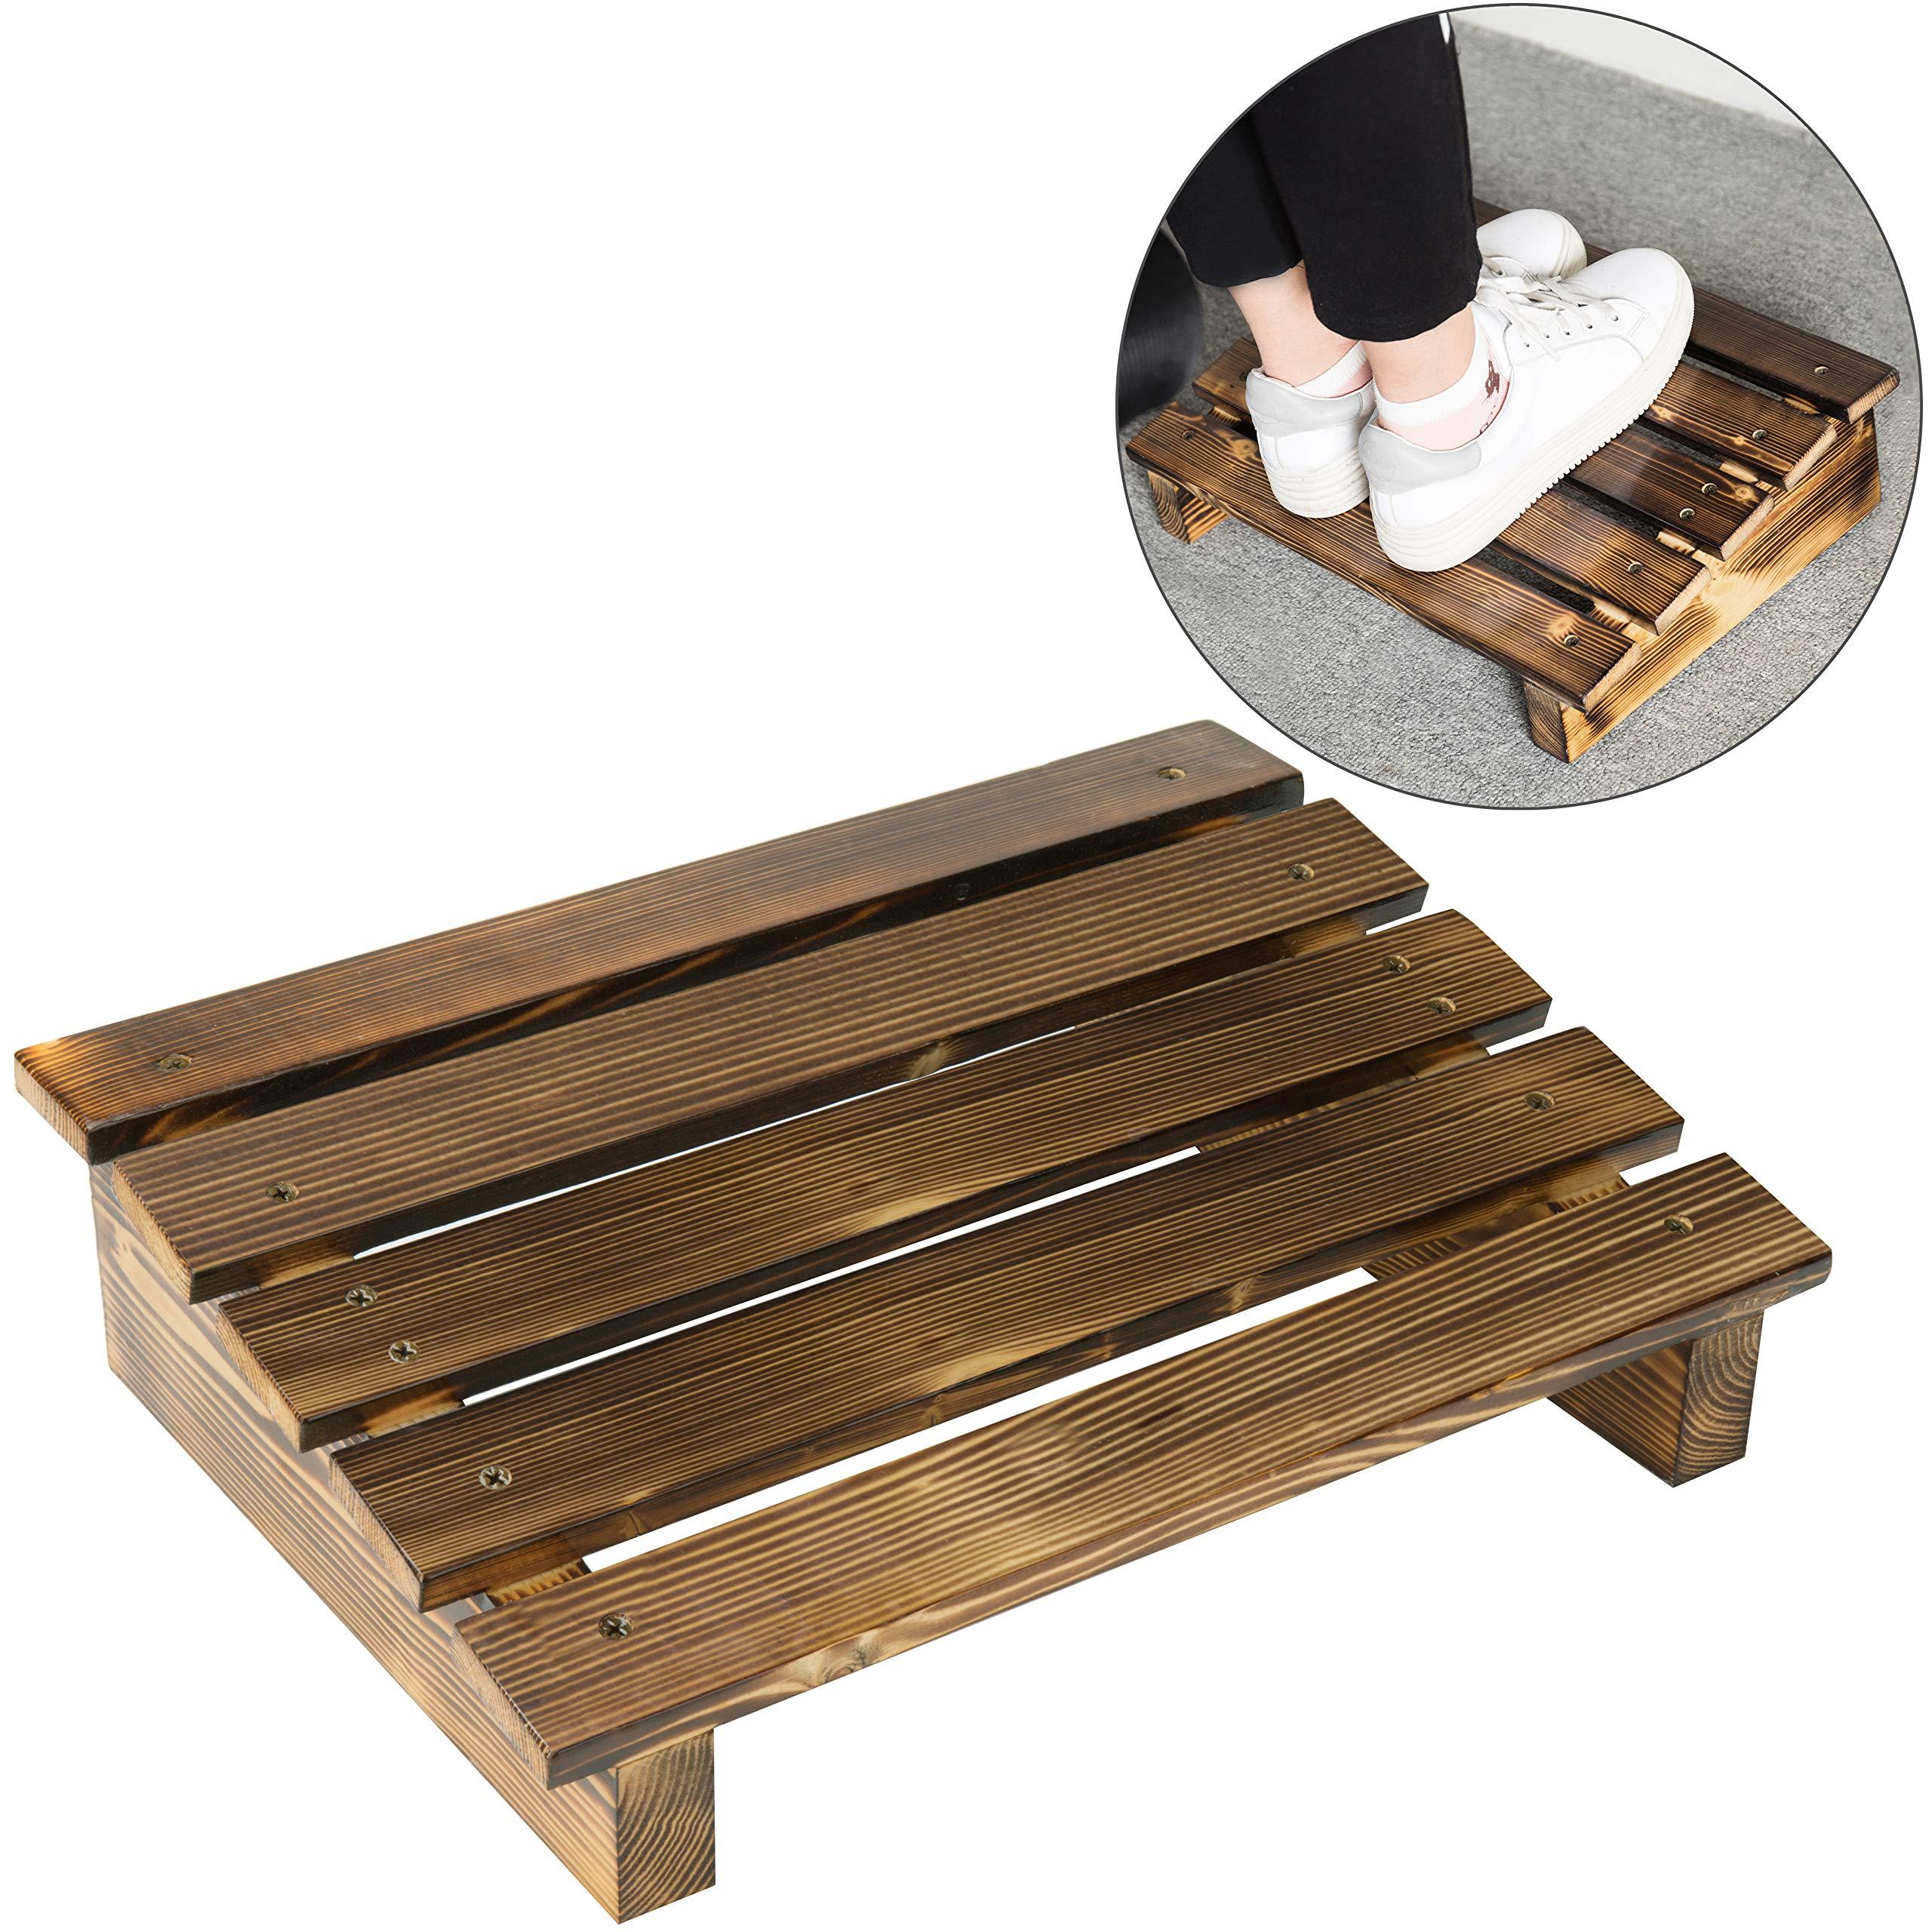 MyGift 15-Inch Burnt Wood Ergonomic Under-Desk Footrest